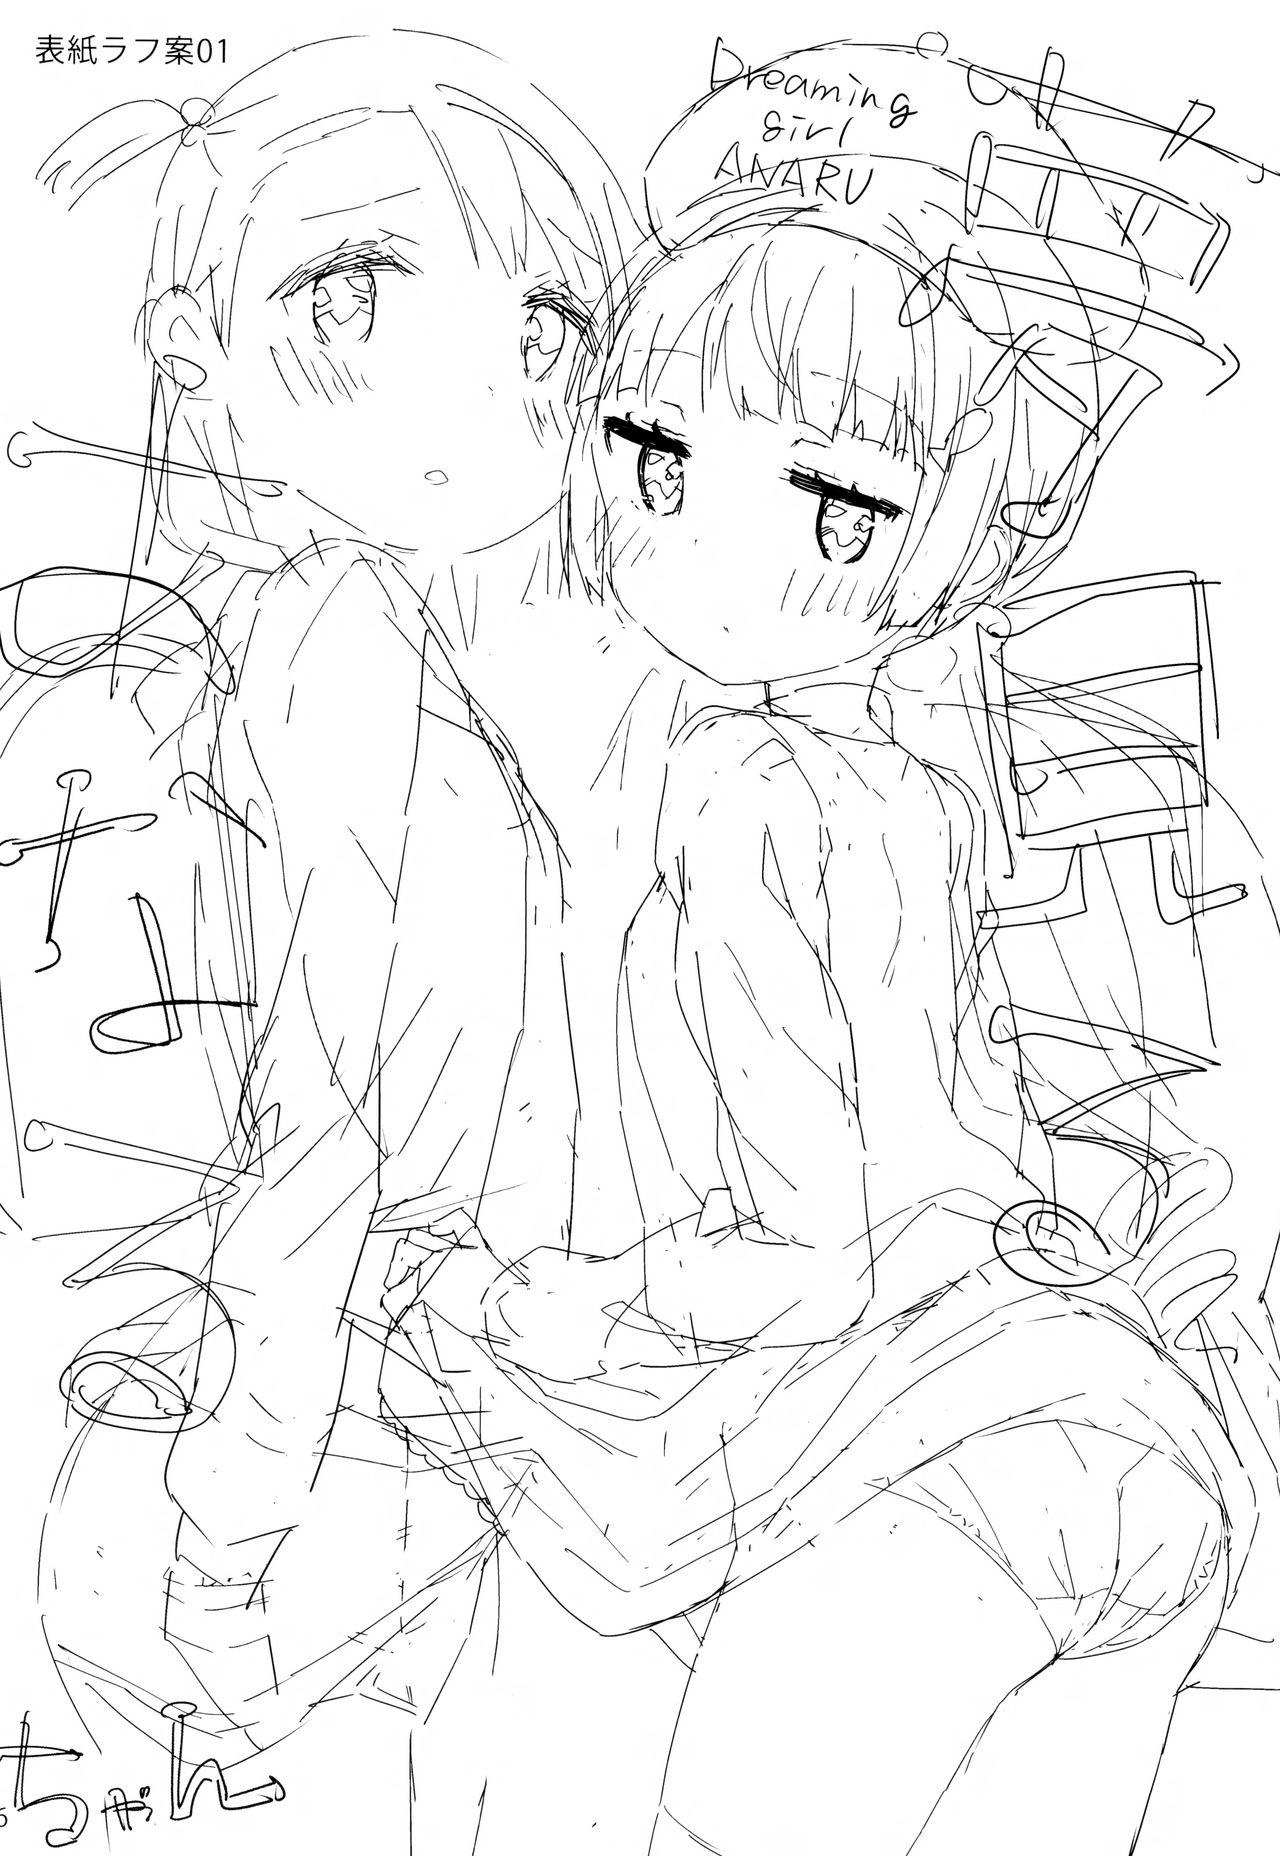 (C95) [Gyuunyuuya-san (Gyuunyuu Nomio)] Yumemiru Anaru-chan - Dreaming Girl ANARU [Chinese] [绅士仓库汉化] 16